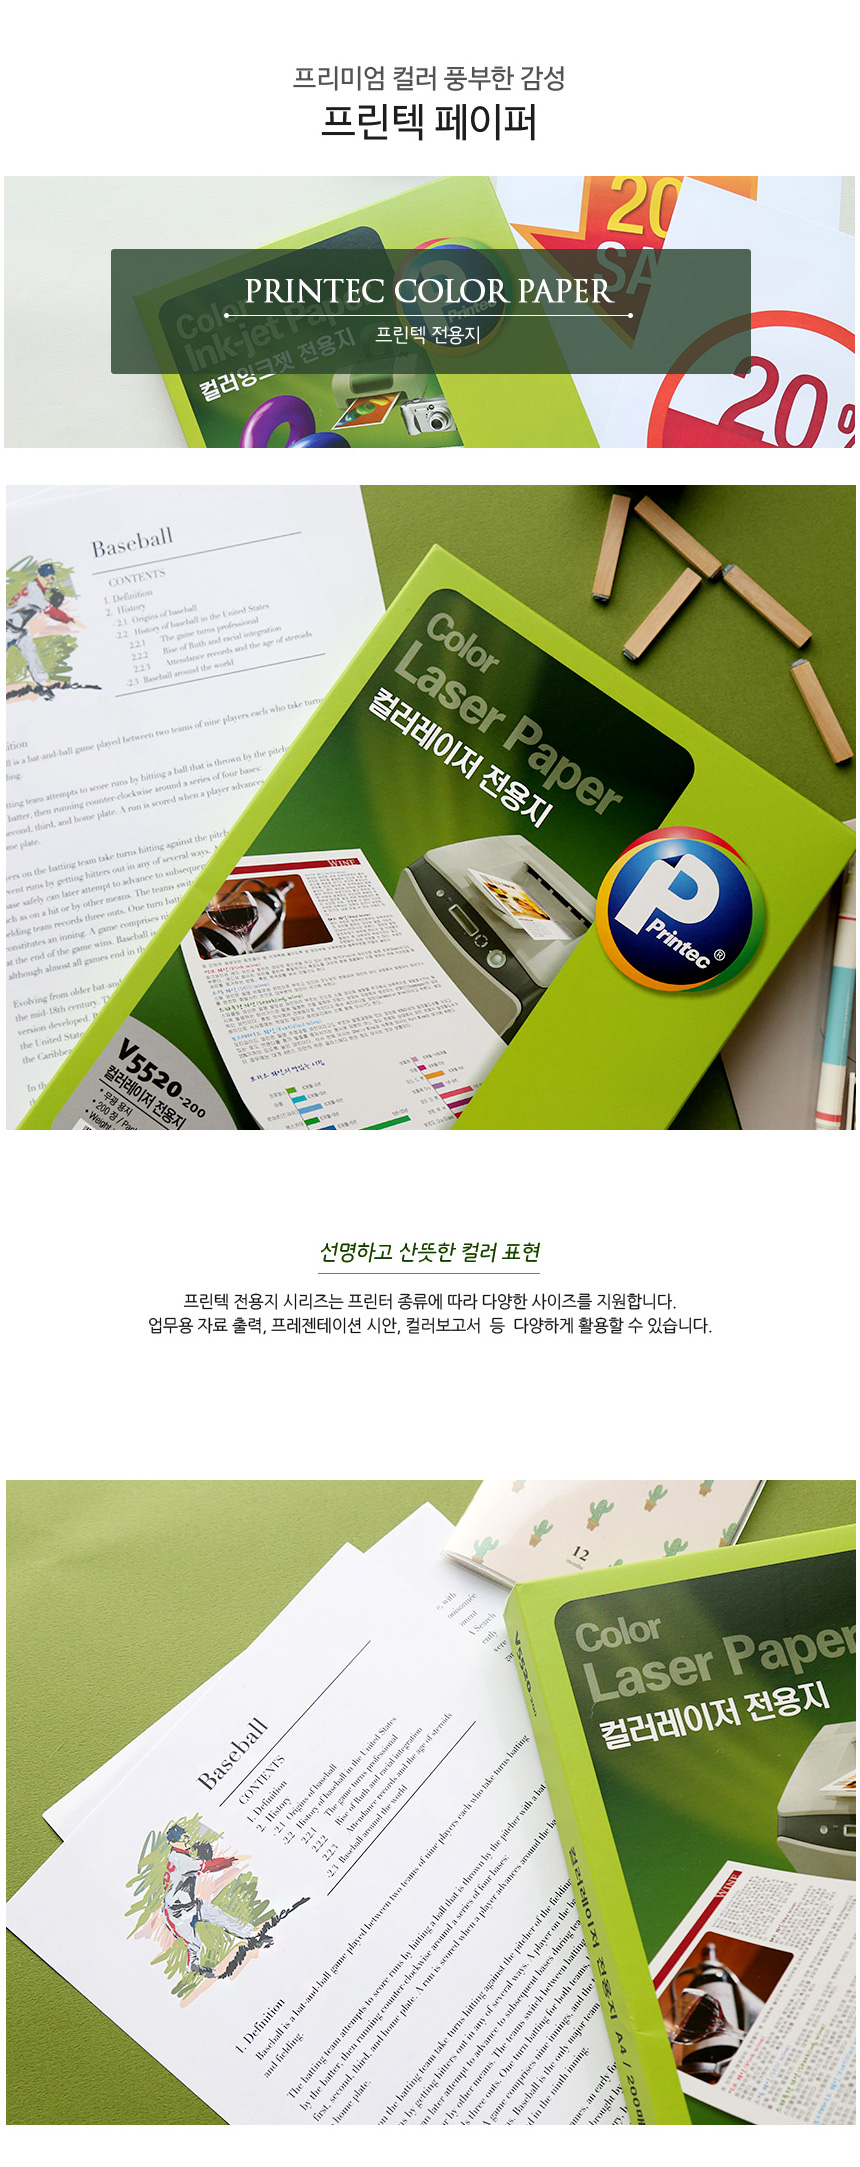 printec_a4_glossy_laser_paper_v5500-20_01.jpg